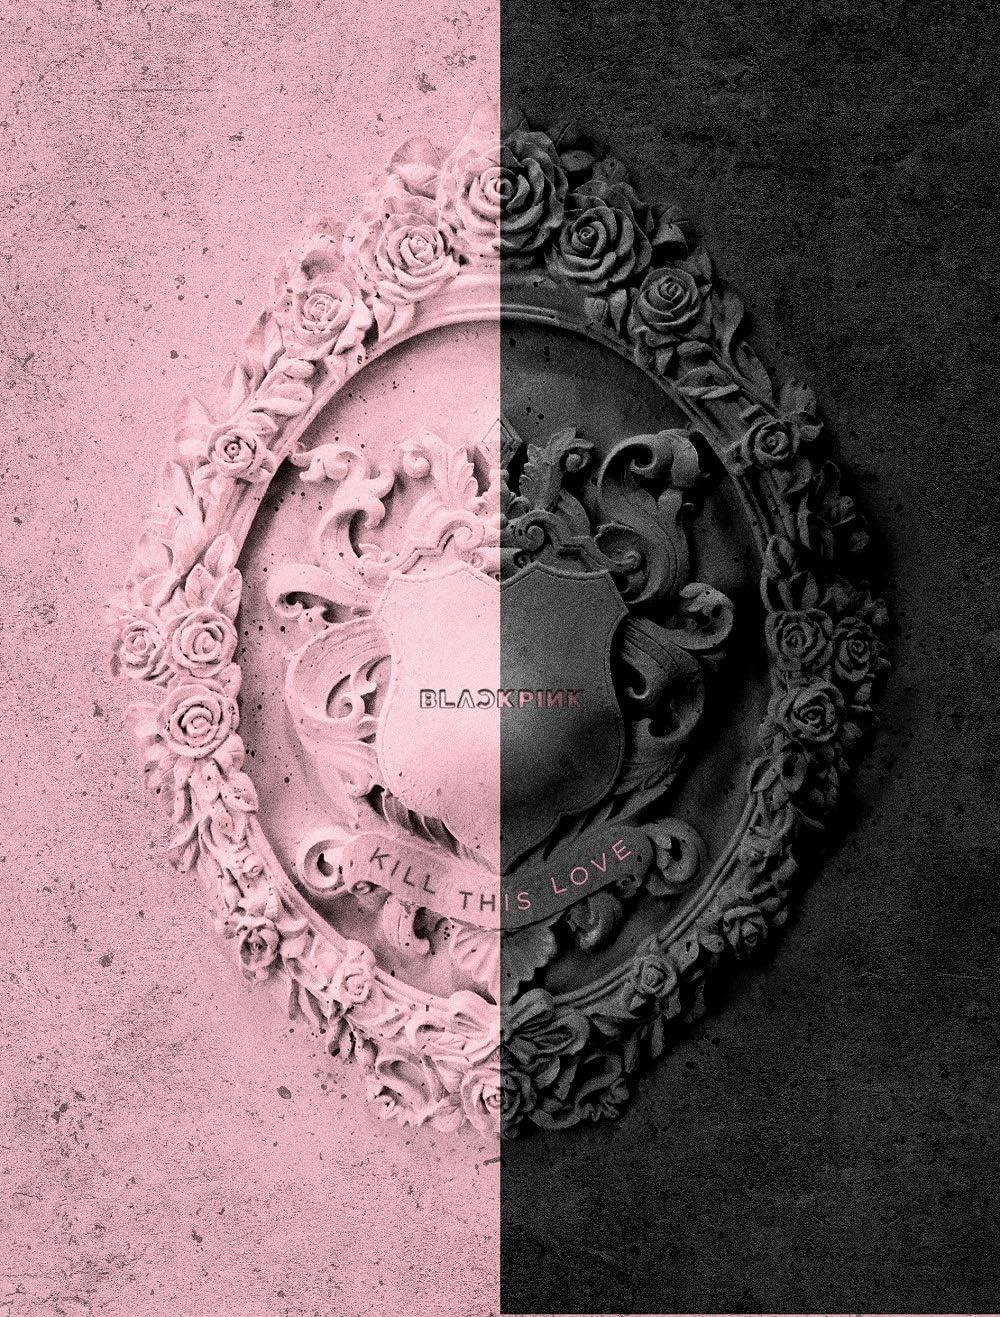 Amazon.com: YG Blackpink - Kill This Love [Pink+Black ver. Set] (2nd Mini  Album) 2CD+2Photobooks+2Lyrics Books+8Photocards+2Polaroid Photocard+2On  Pack Poster+1Folded Poster+Double Side Extra Photocards Set: Posters &  Prints